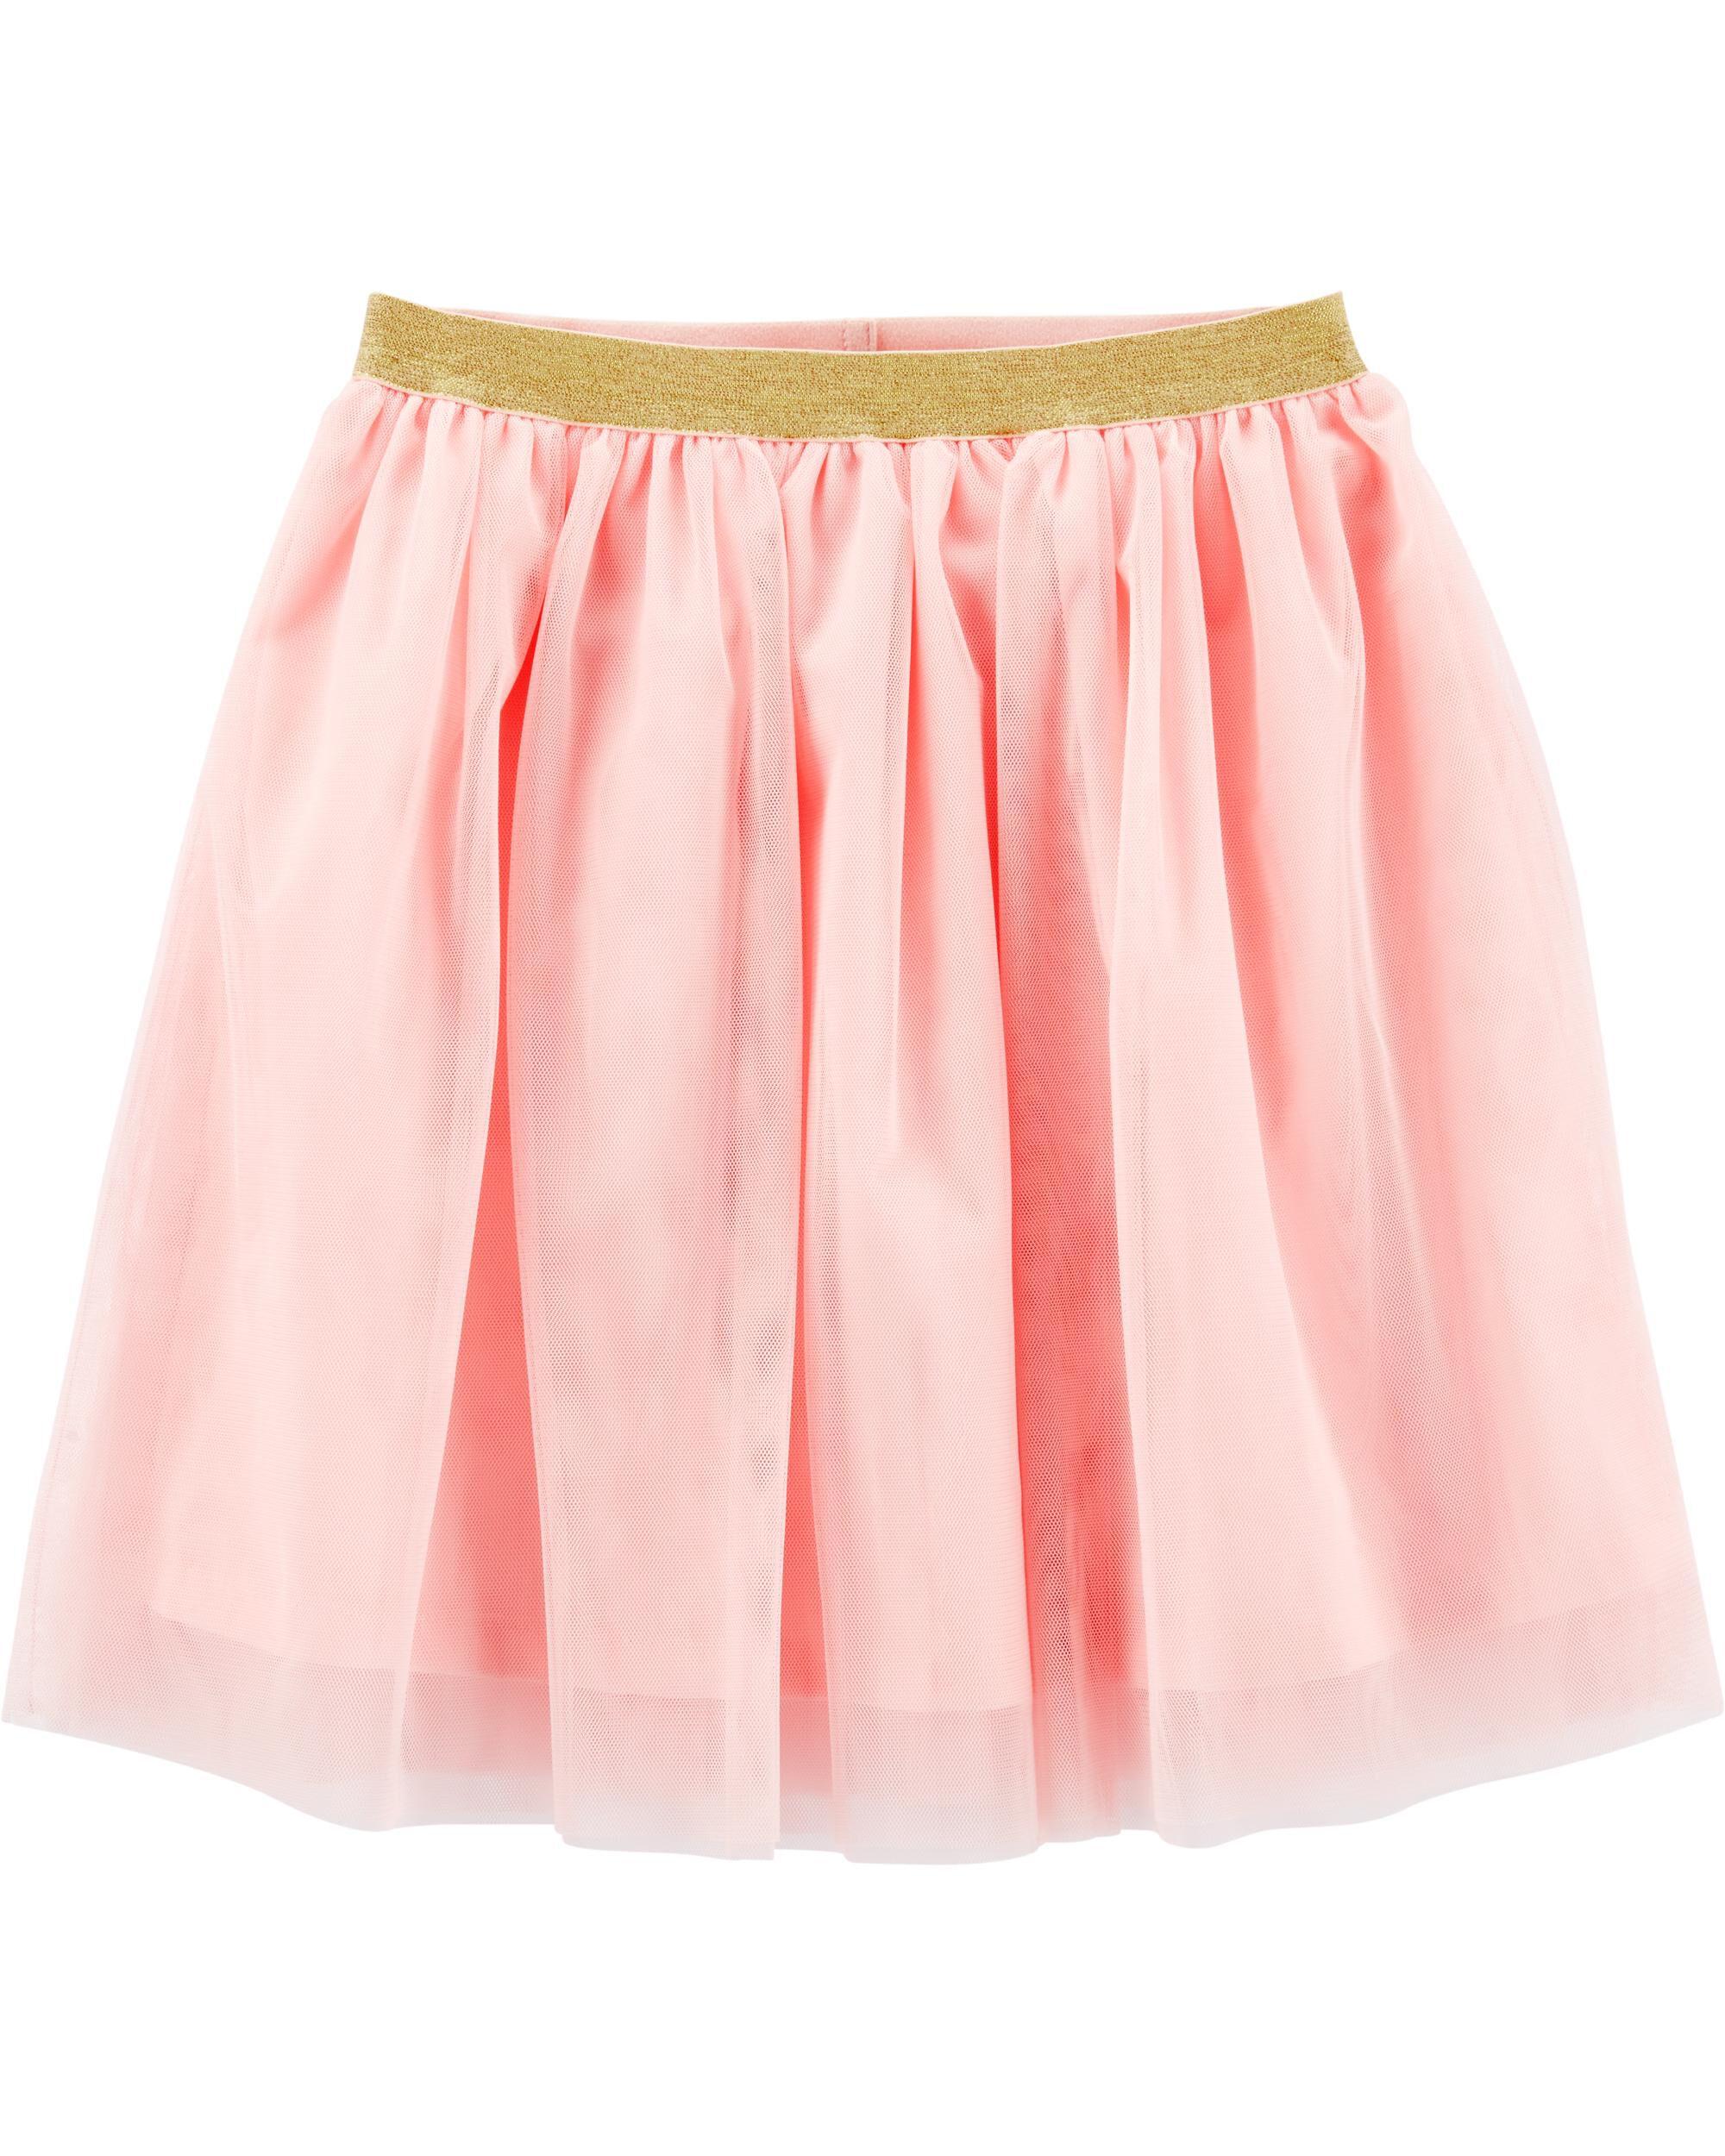 *Clearance*  Tulle Tutu Skirt